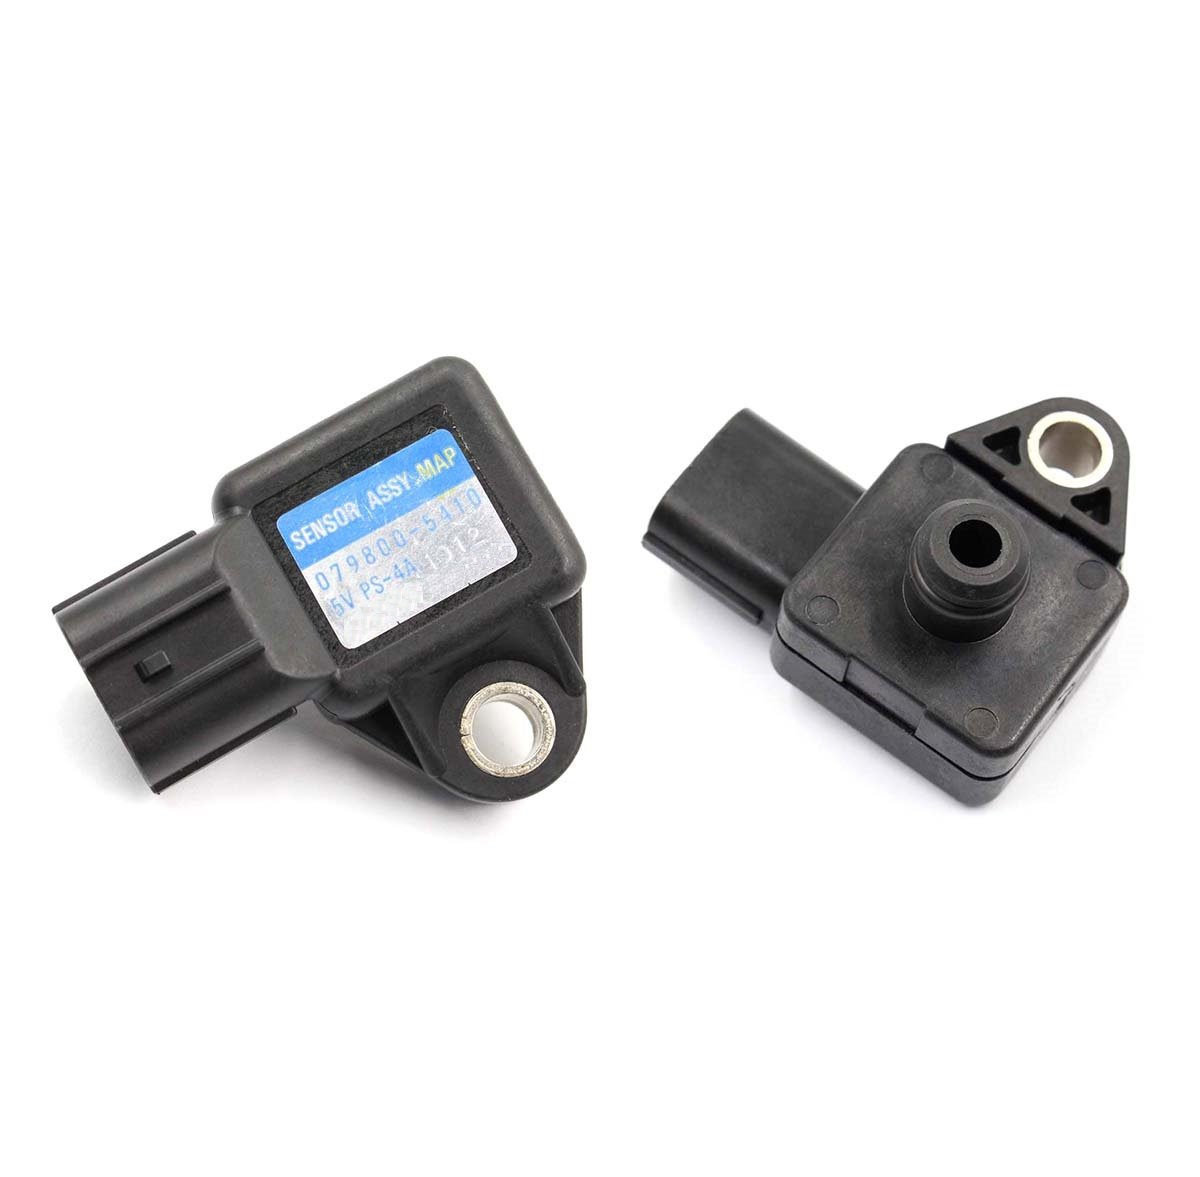 AUTOKAY MAP Sensor 37830-PGK-A01 for Honda Acura Civic Accord CRV by AUTOKAY